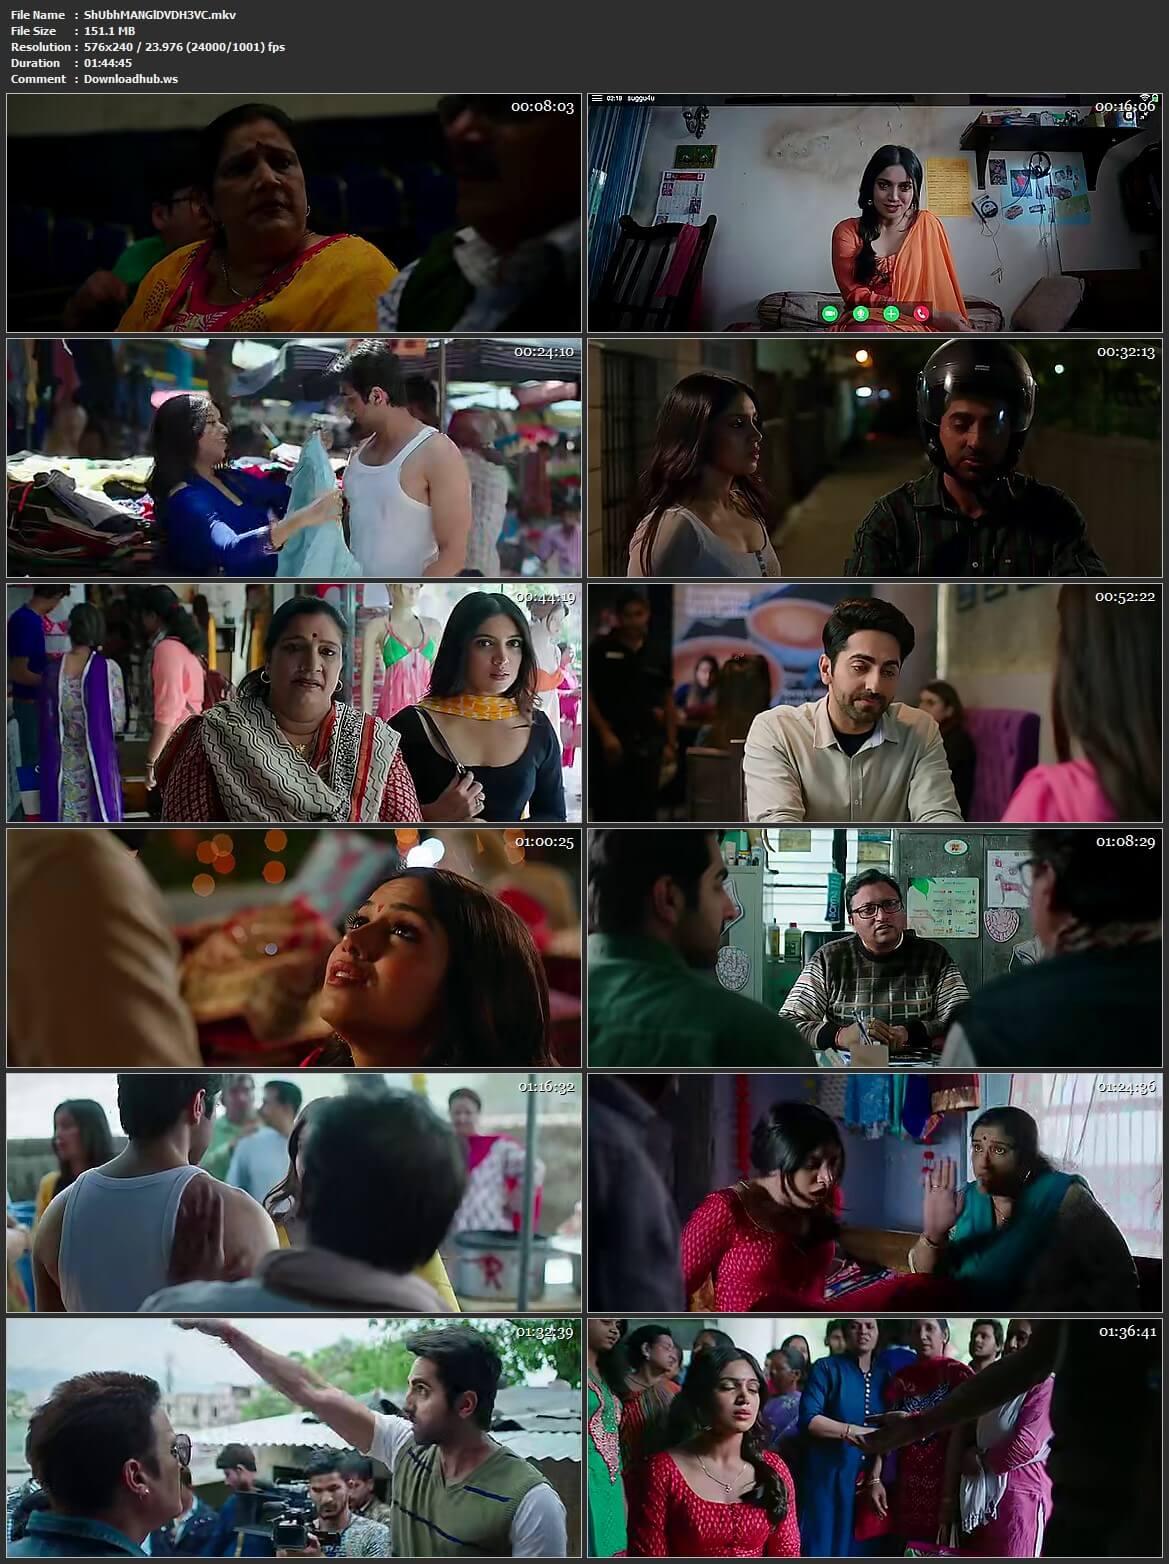 Shubh Mangal Saavdhan 2017 Hindi HEVC 480p DVDRip ESubs